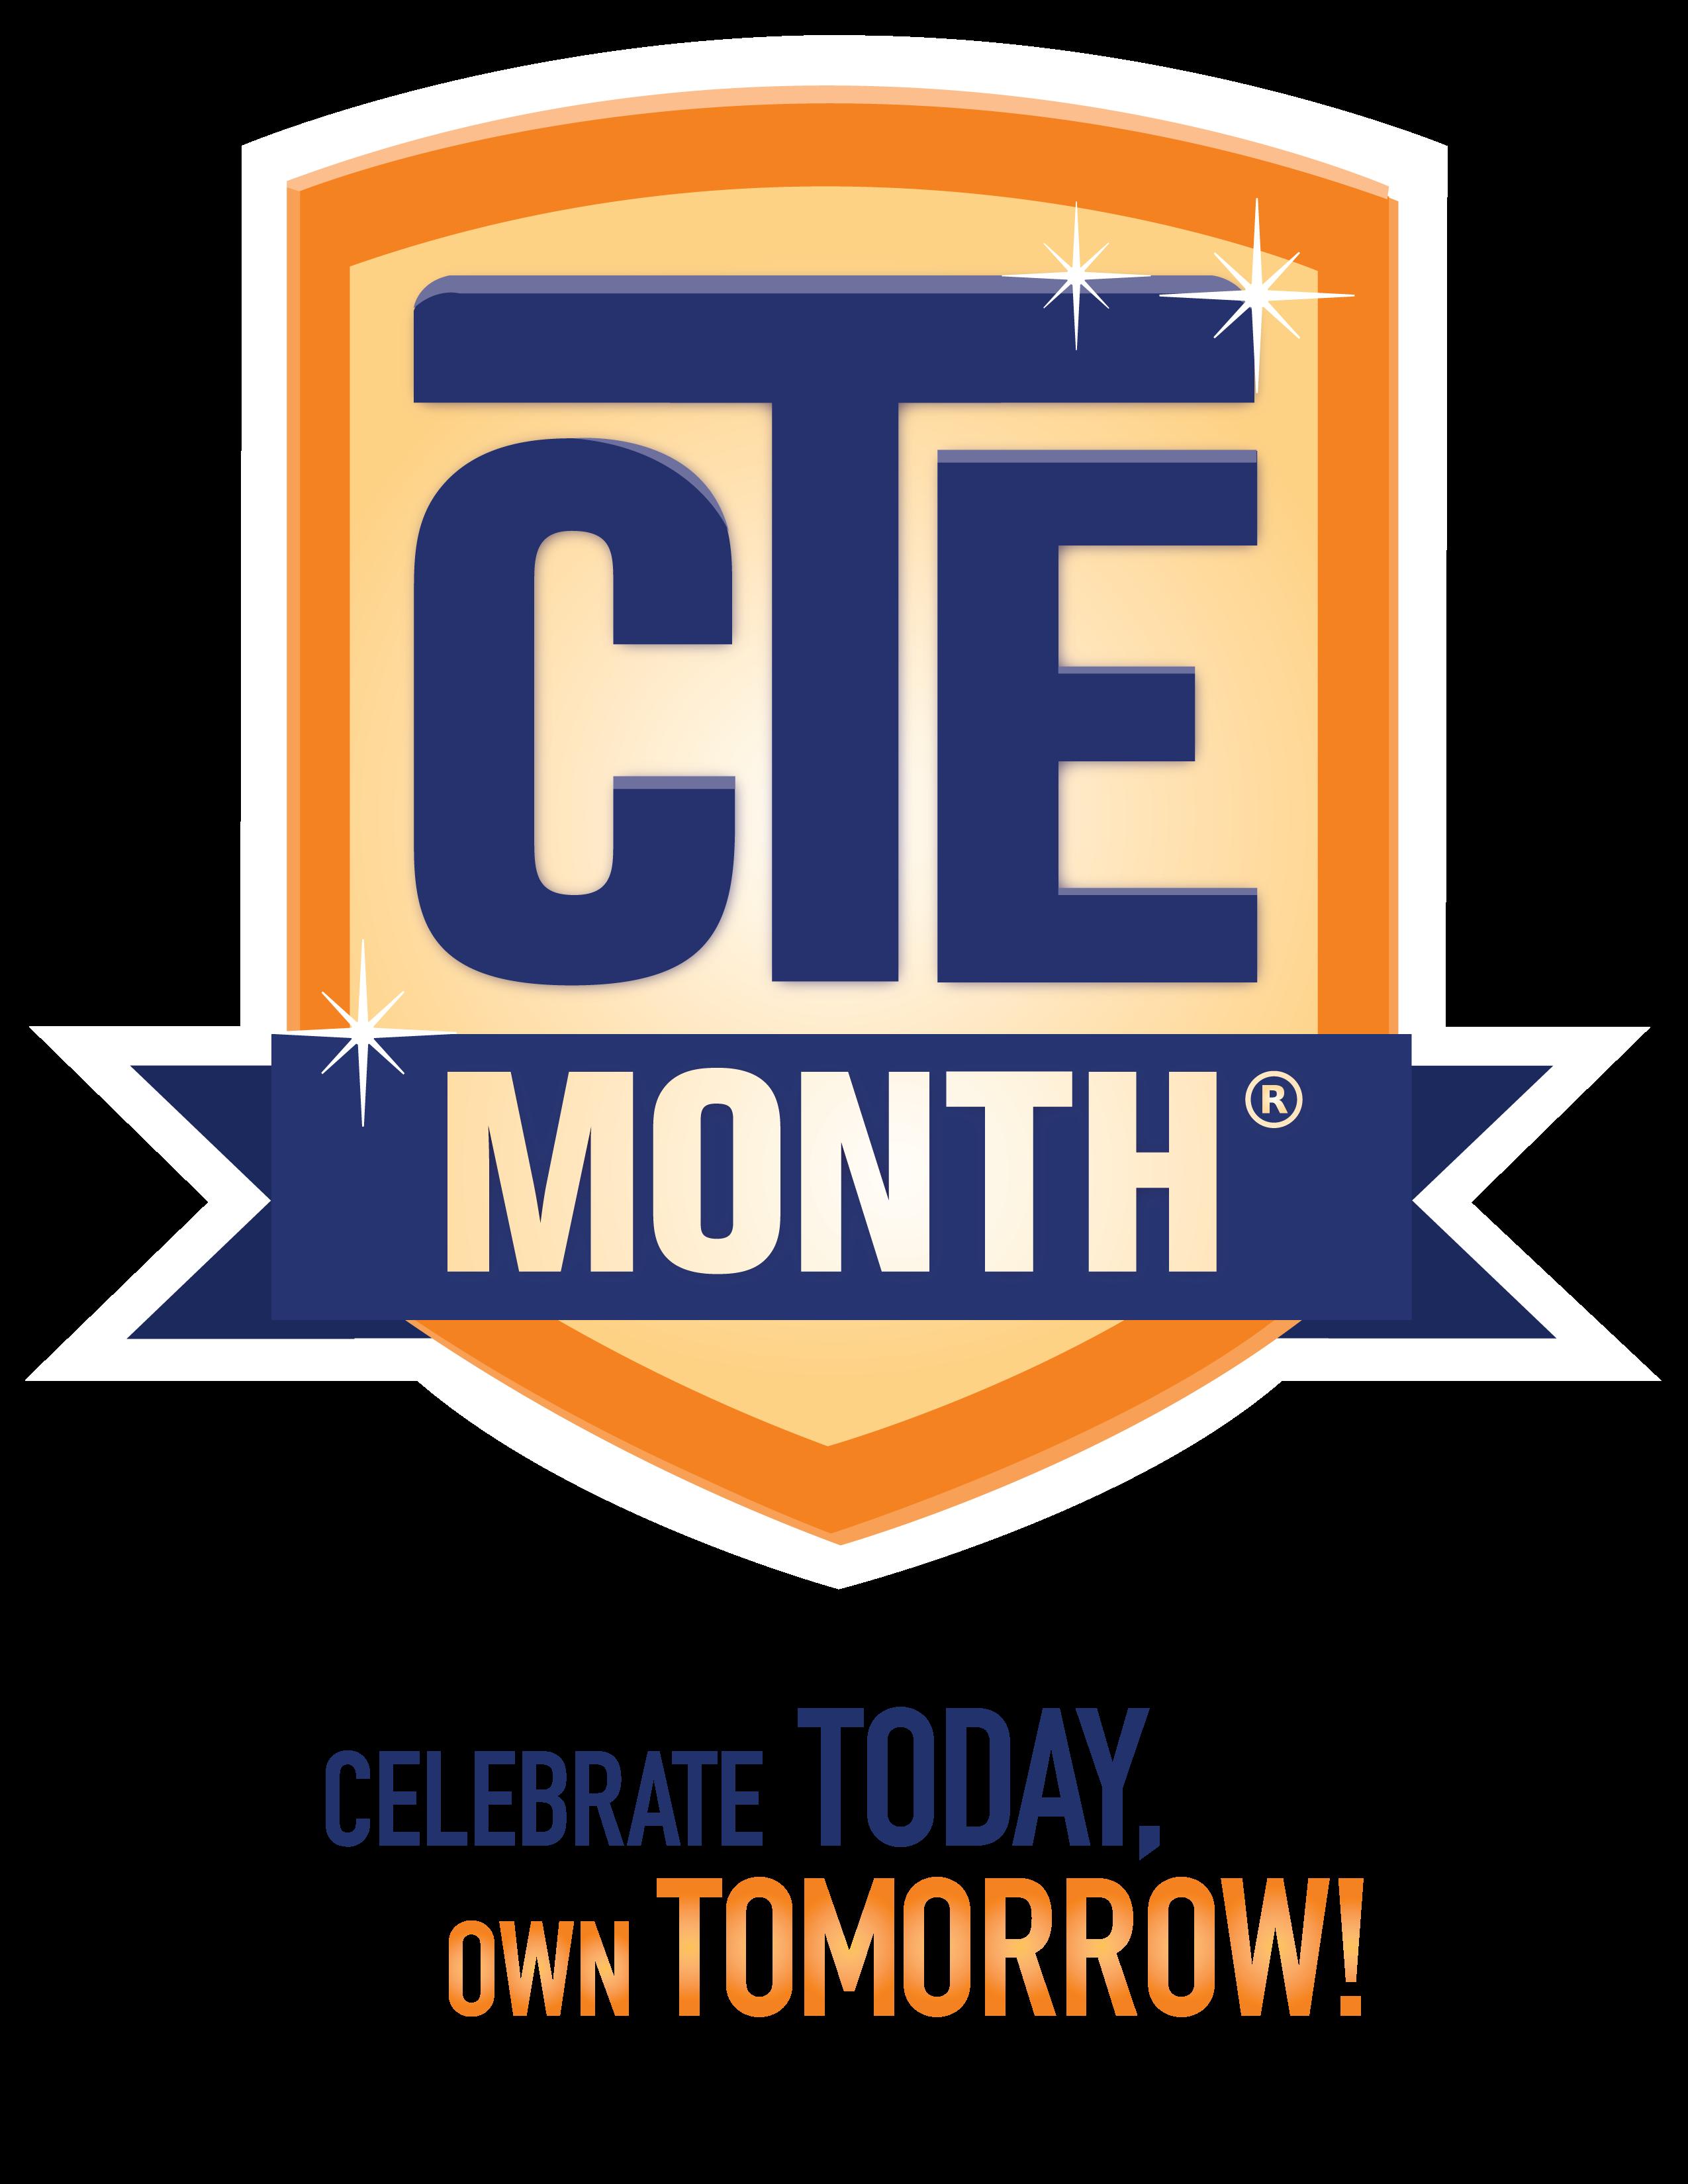 Celebrate CTE MONTH